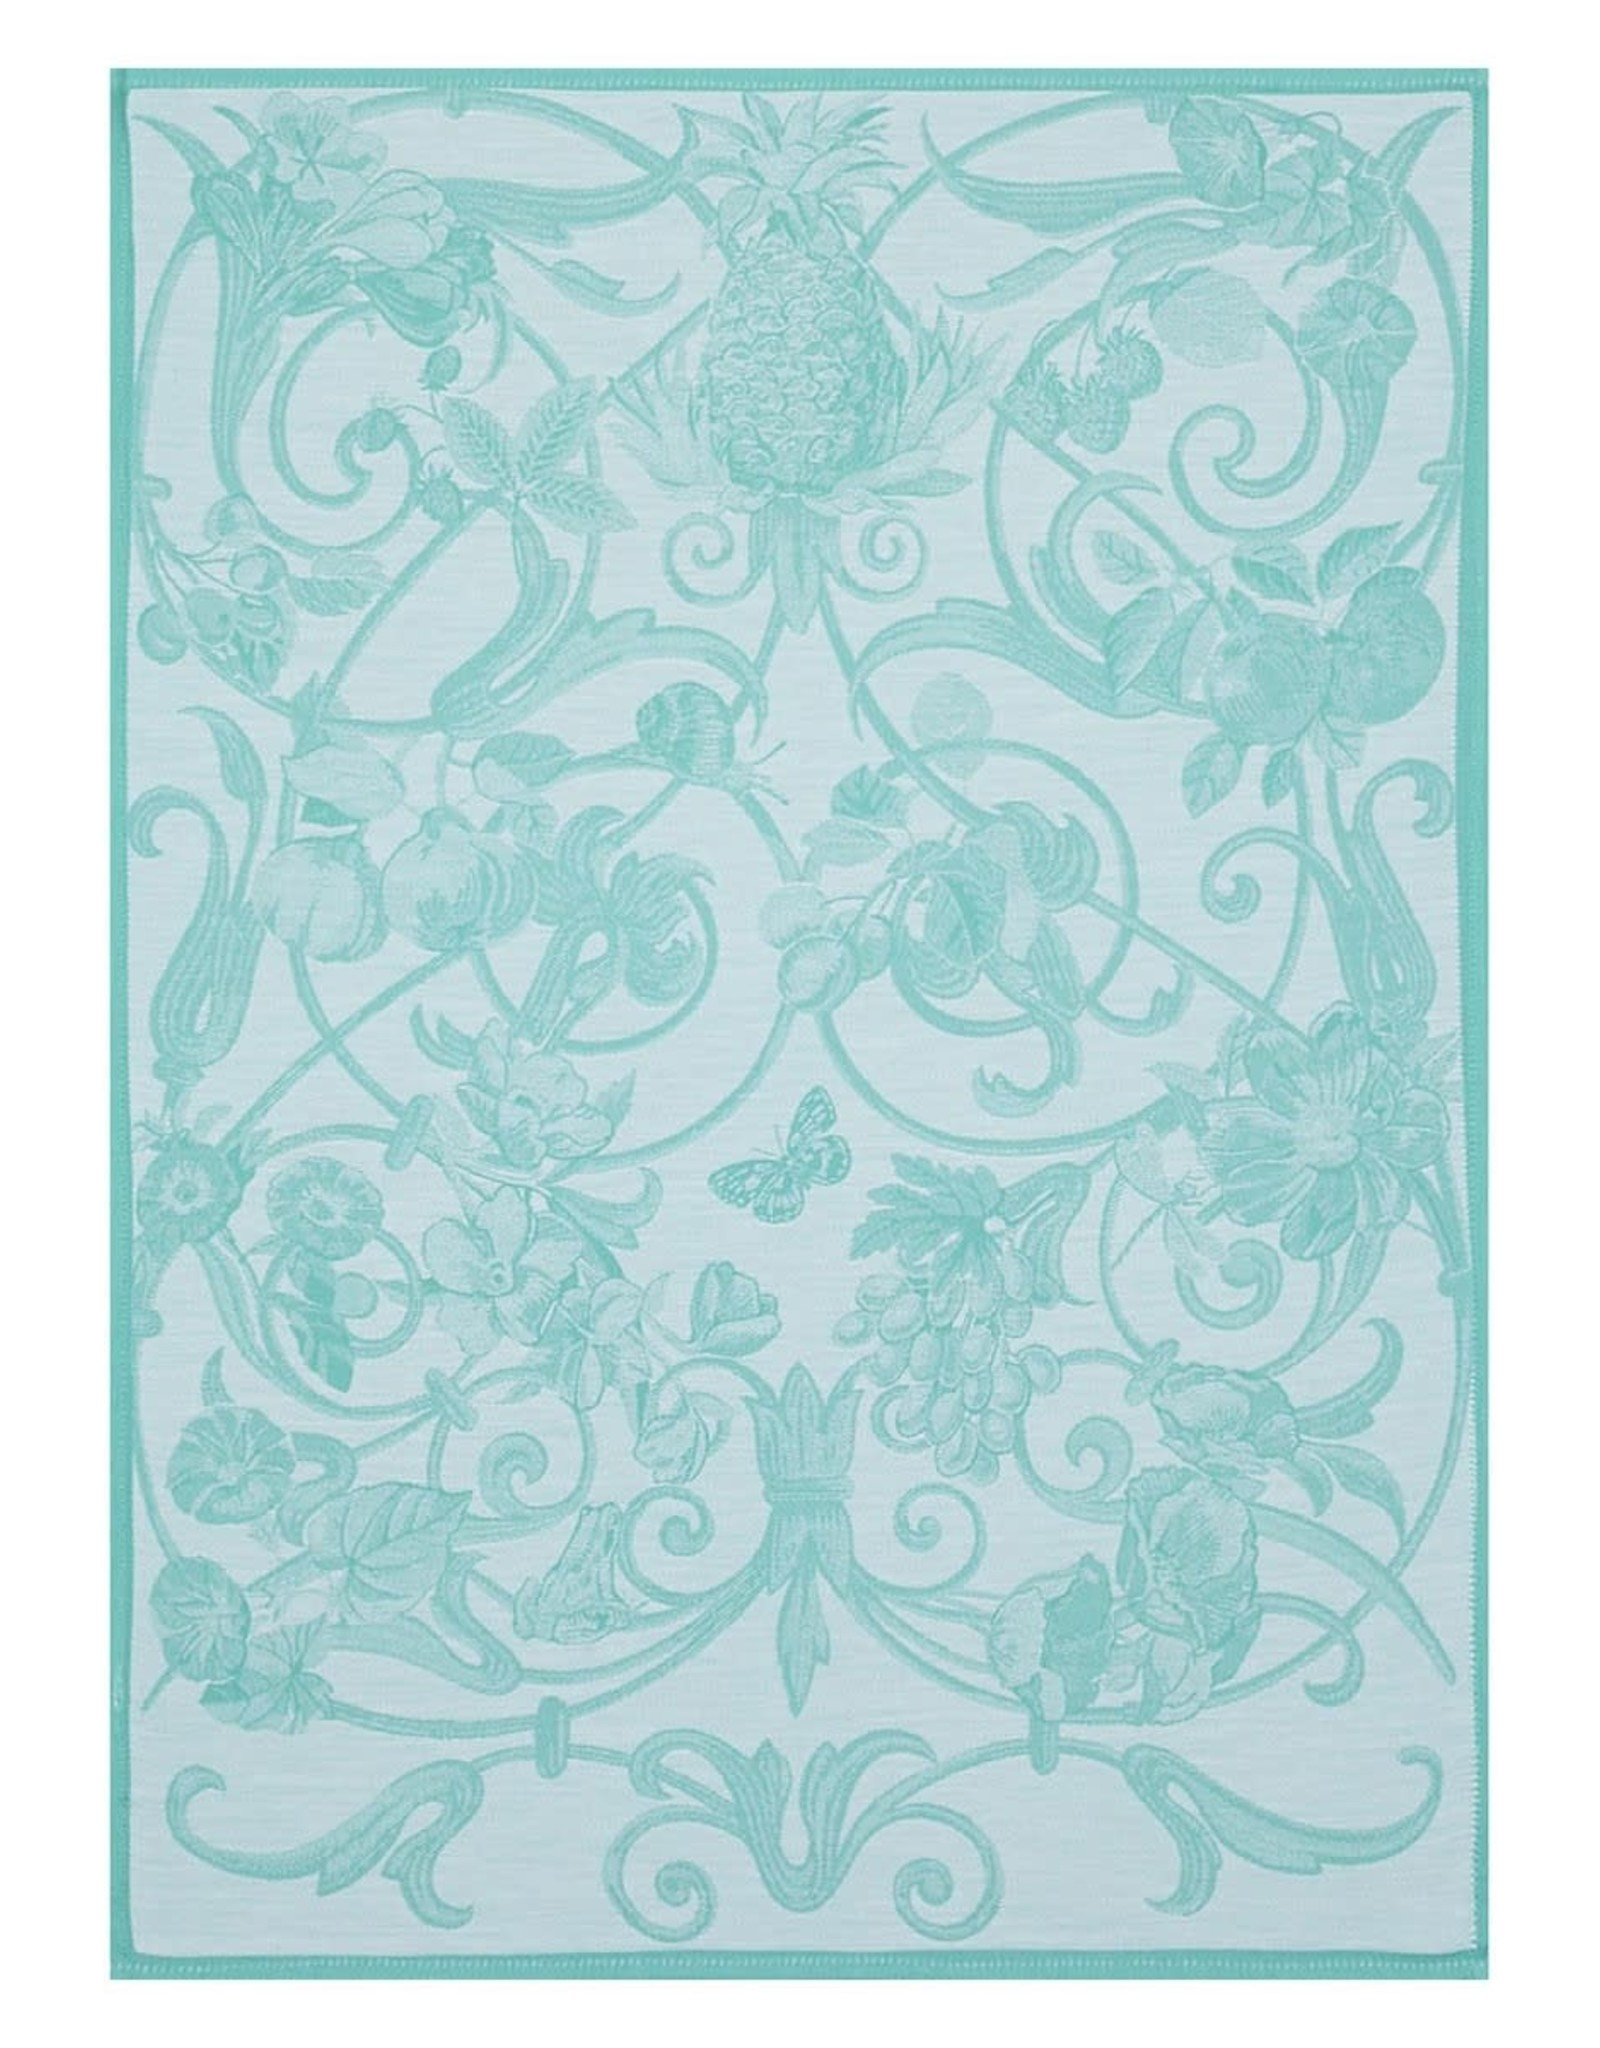 Le Jacquard Francais Tutti Frutti Mint Tea Towel